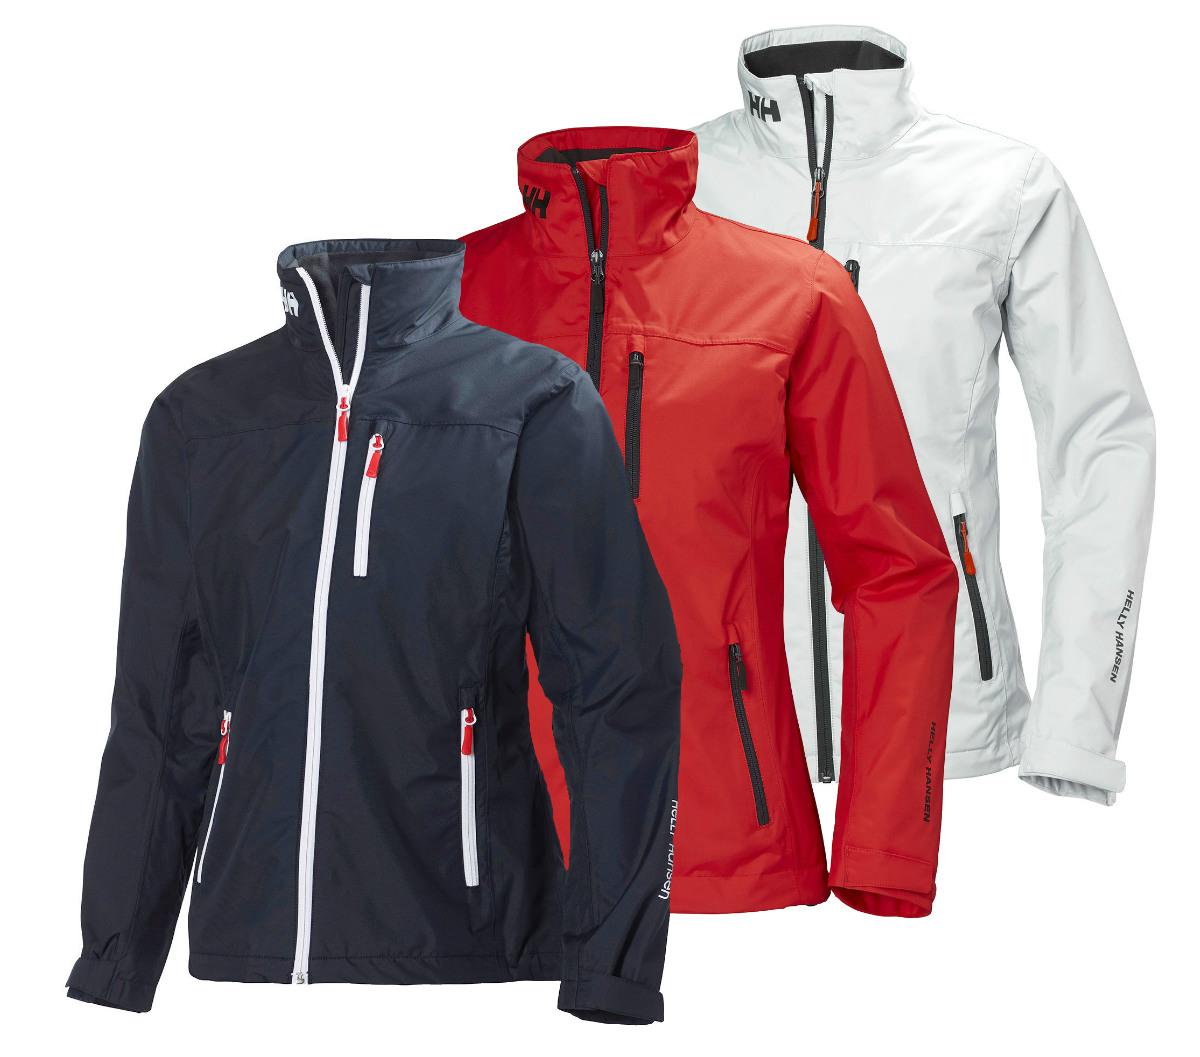 Helly Hansen Womens Crew Midlayer Crew Jacket Navy Breathable Rain Jacket